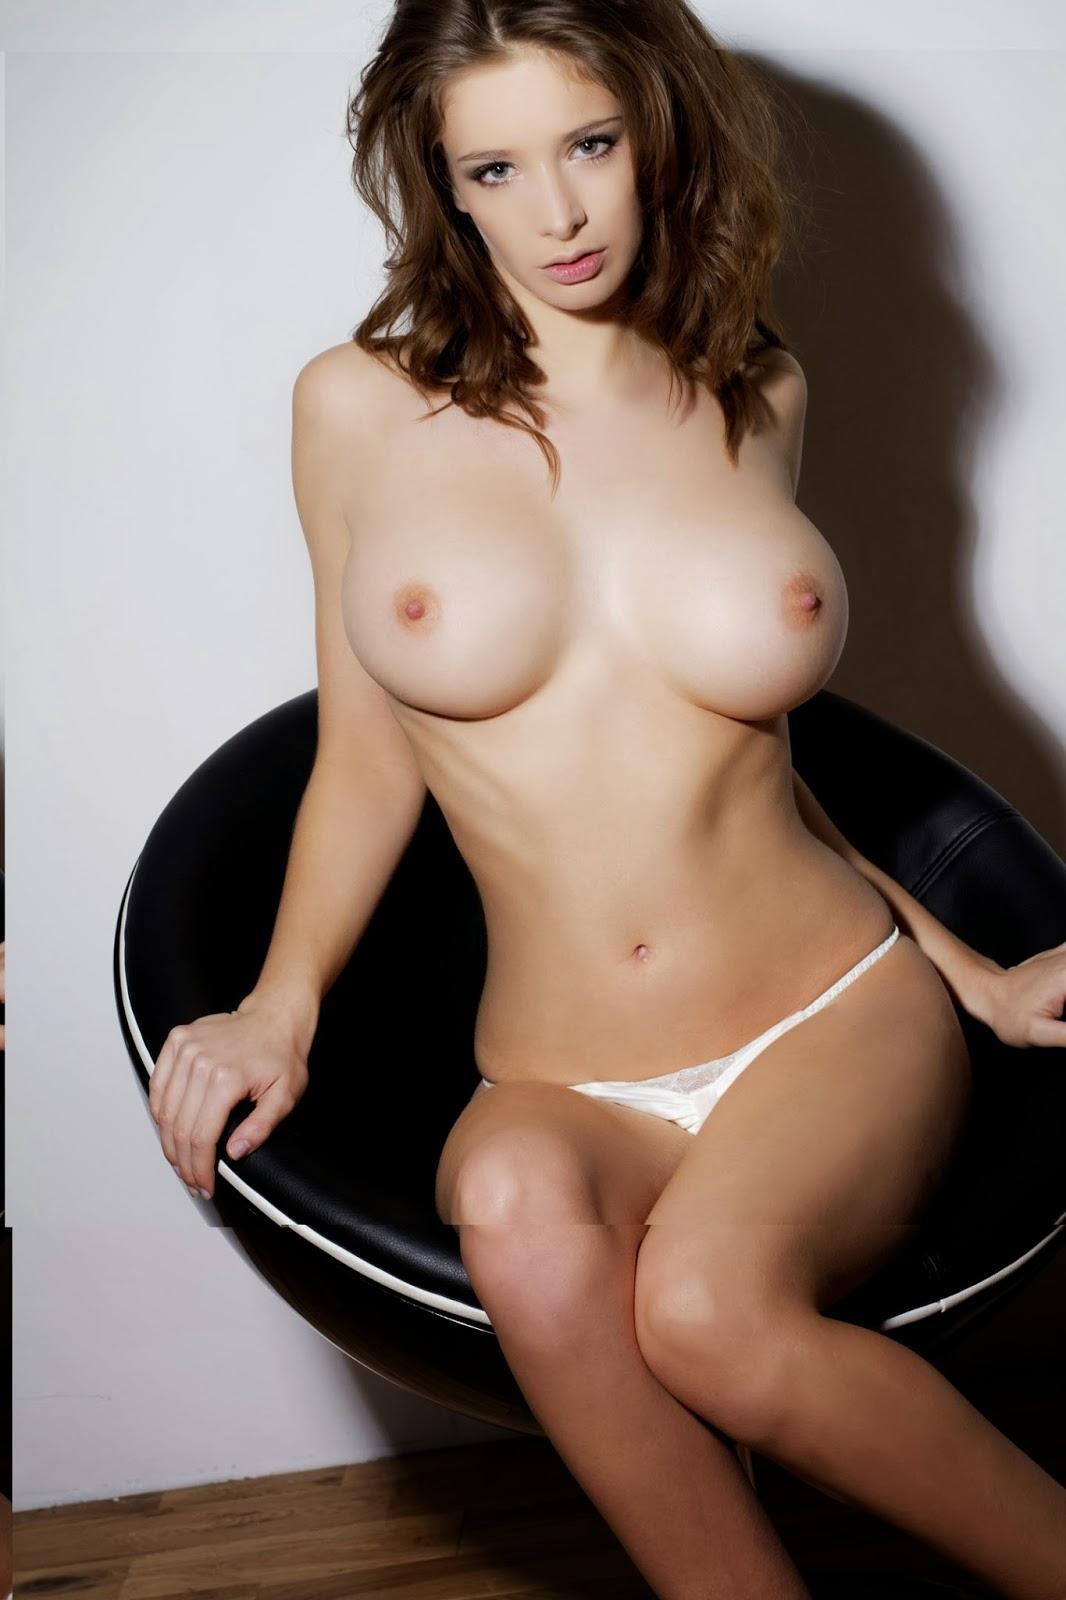 Shaw nude emily Emily Shaw's